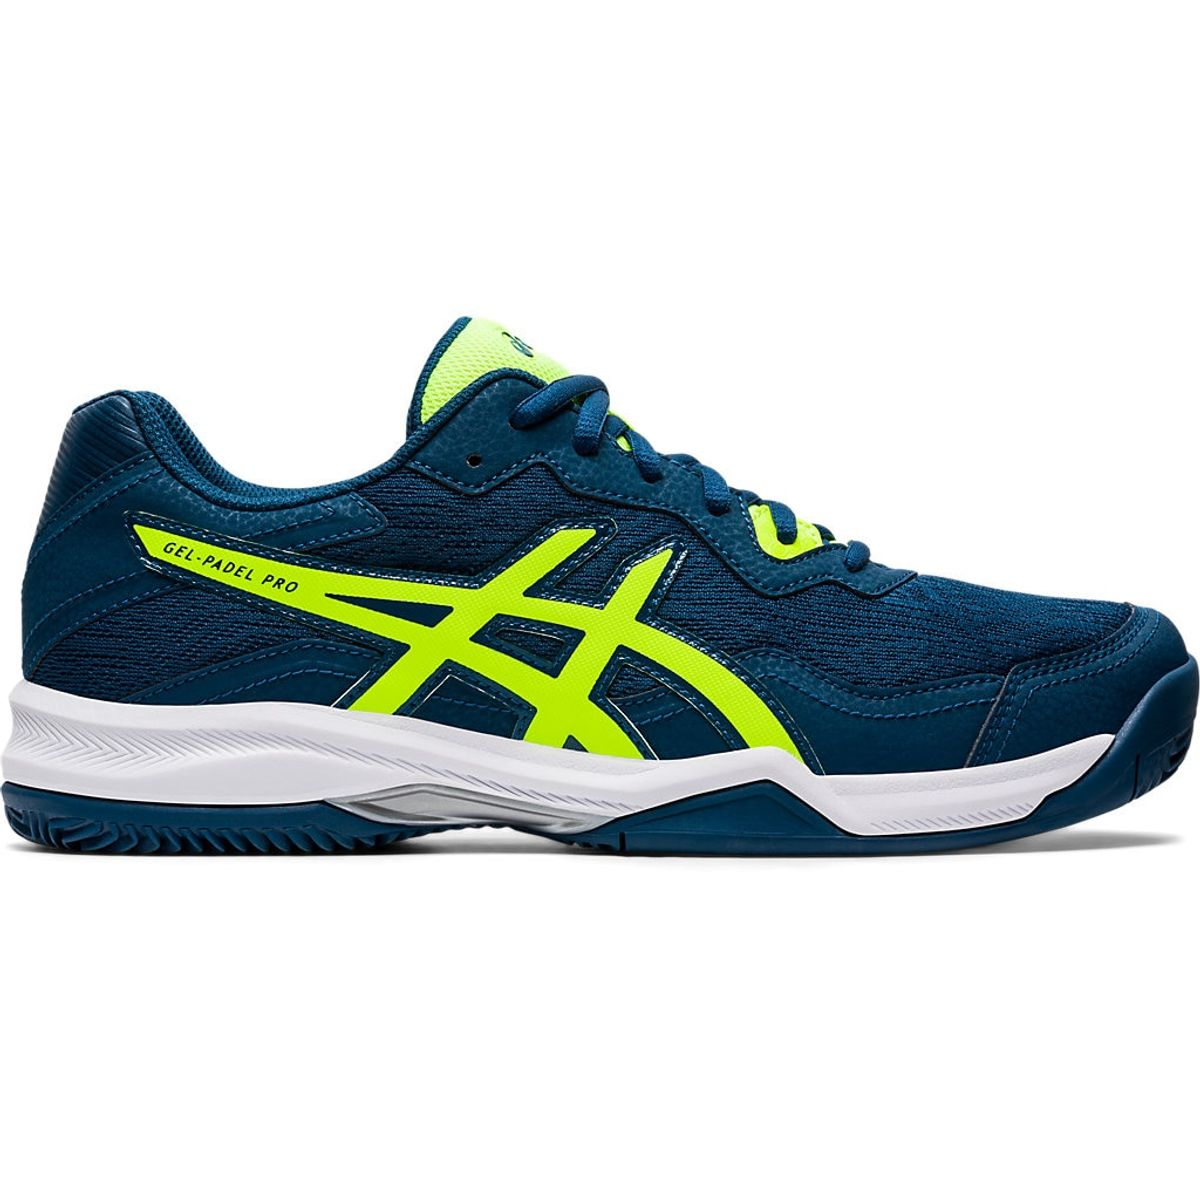 Tenis-Asics-GEL-Padel-Pro-4---Masculino---Azul